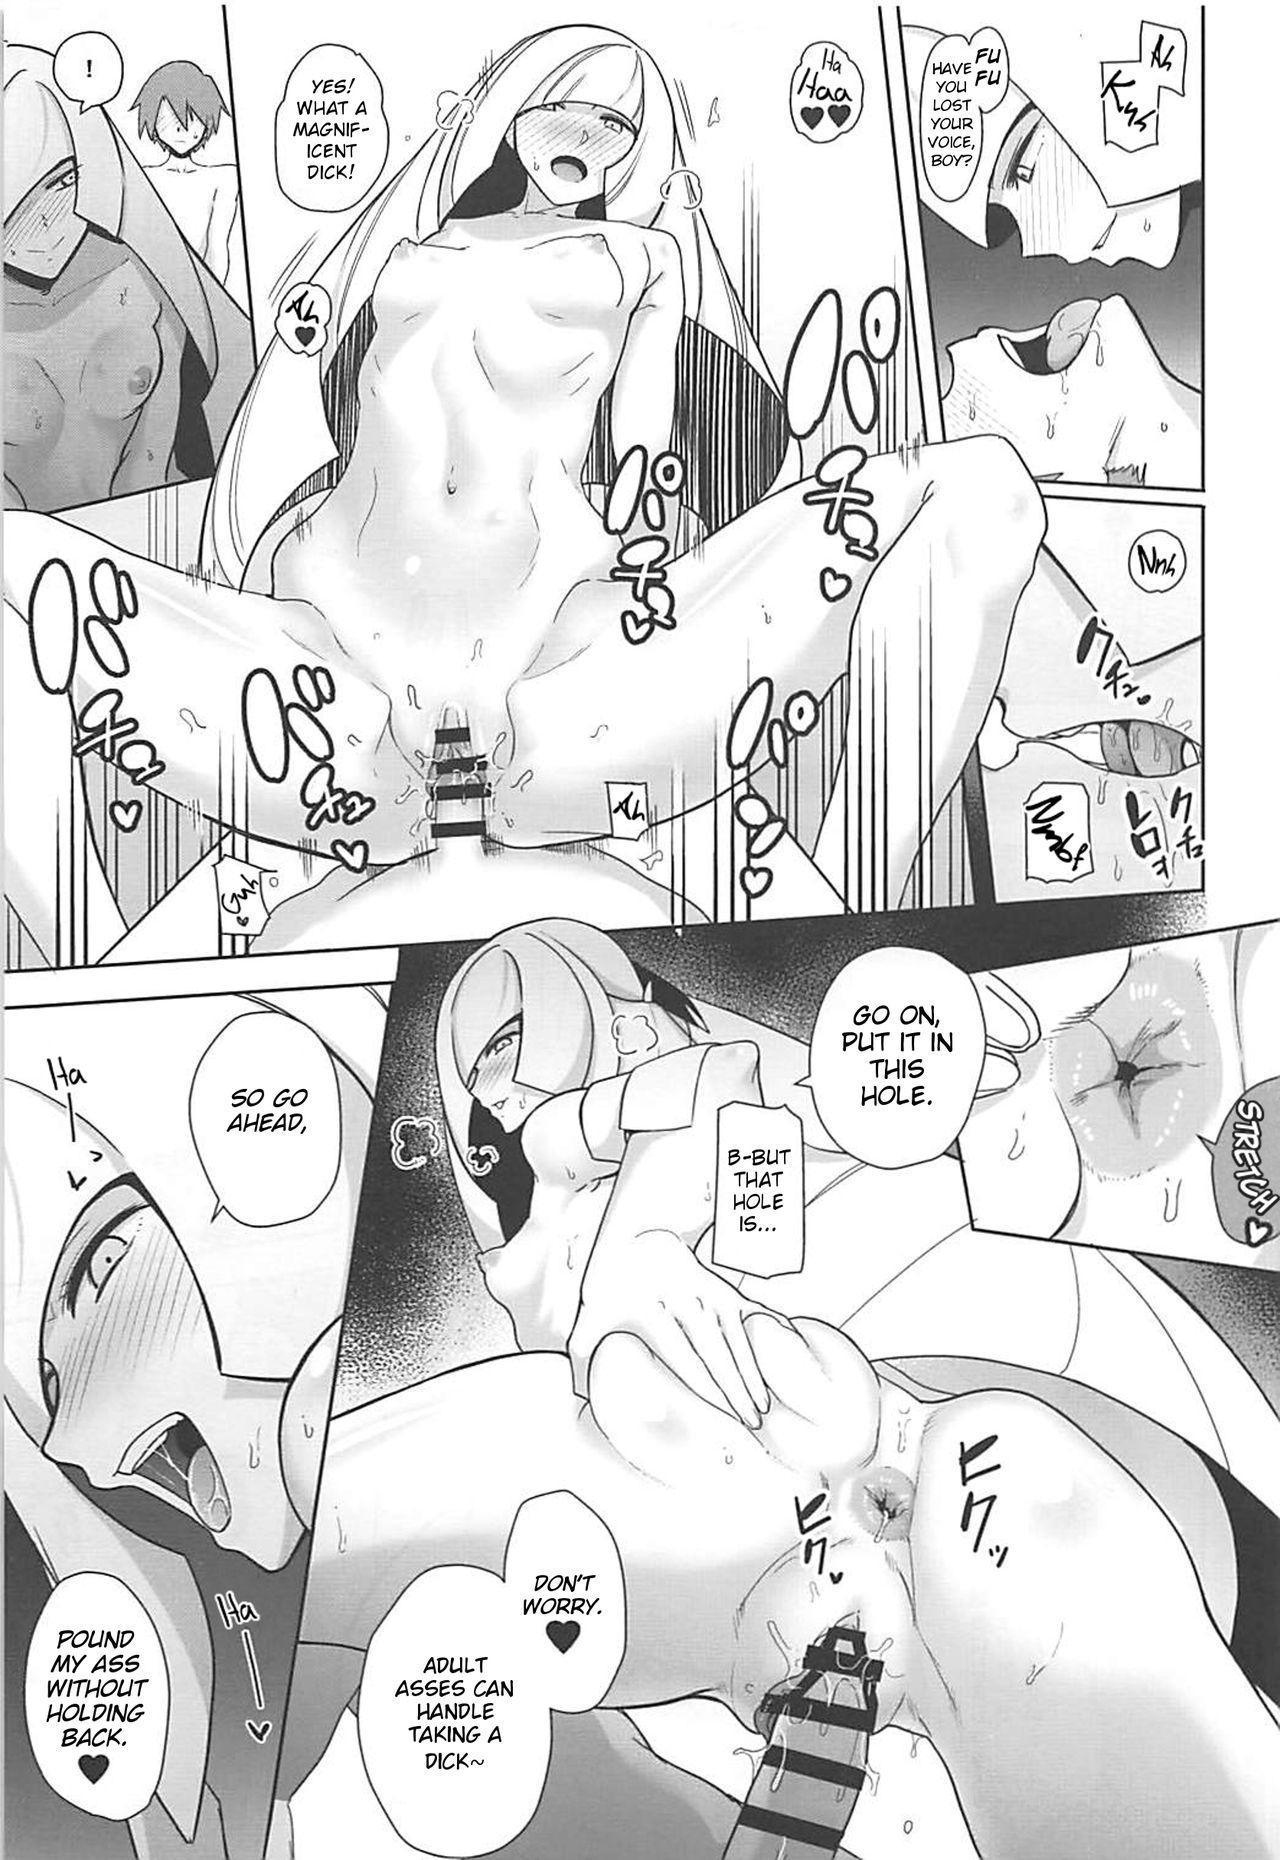 (SC2019 Spring) [DOLL PLAY (Kurosu Gatari)] Alola no Yoru no Sugata 3 (Pokémon Sun and Moon)   The Feeling of Alolan Night 3 [English] [Learn JP With H] 15